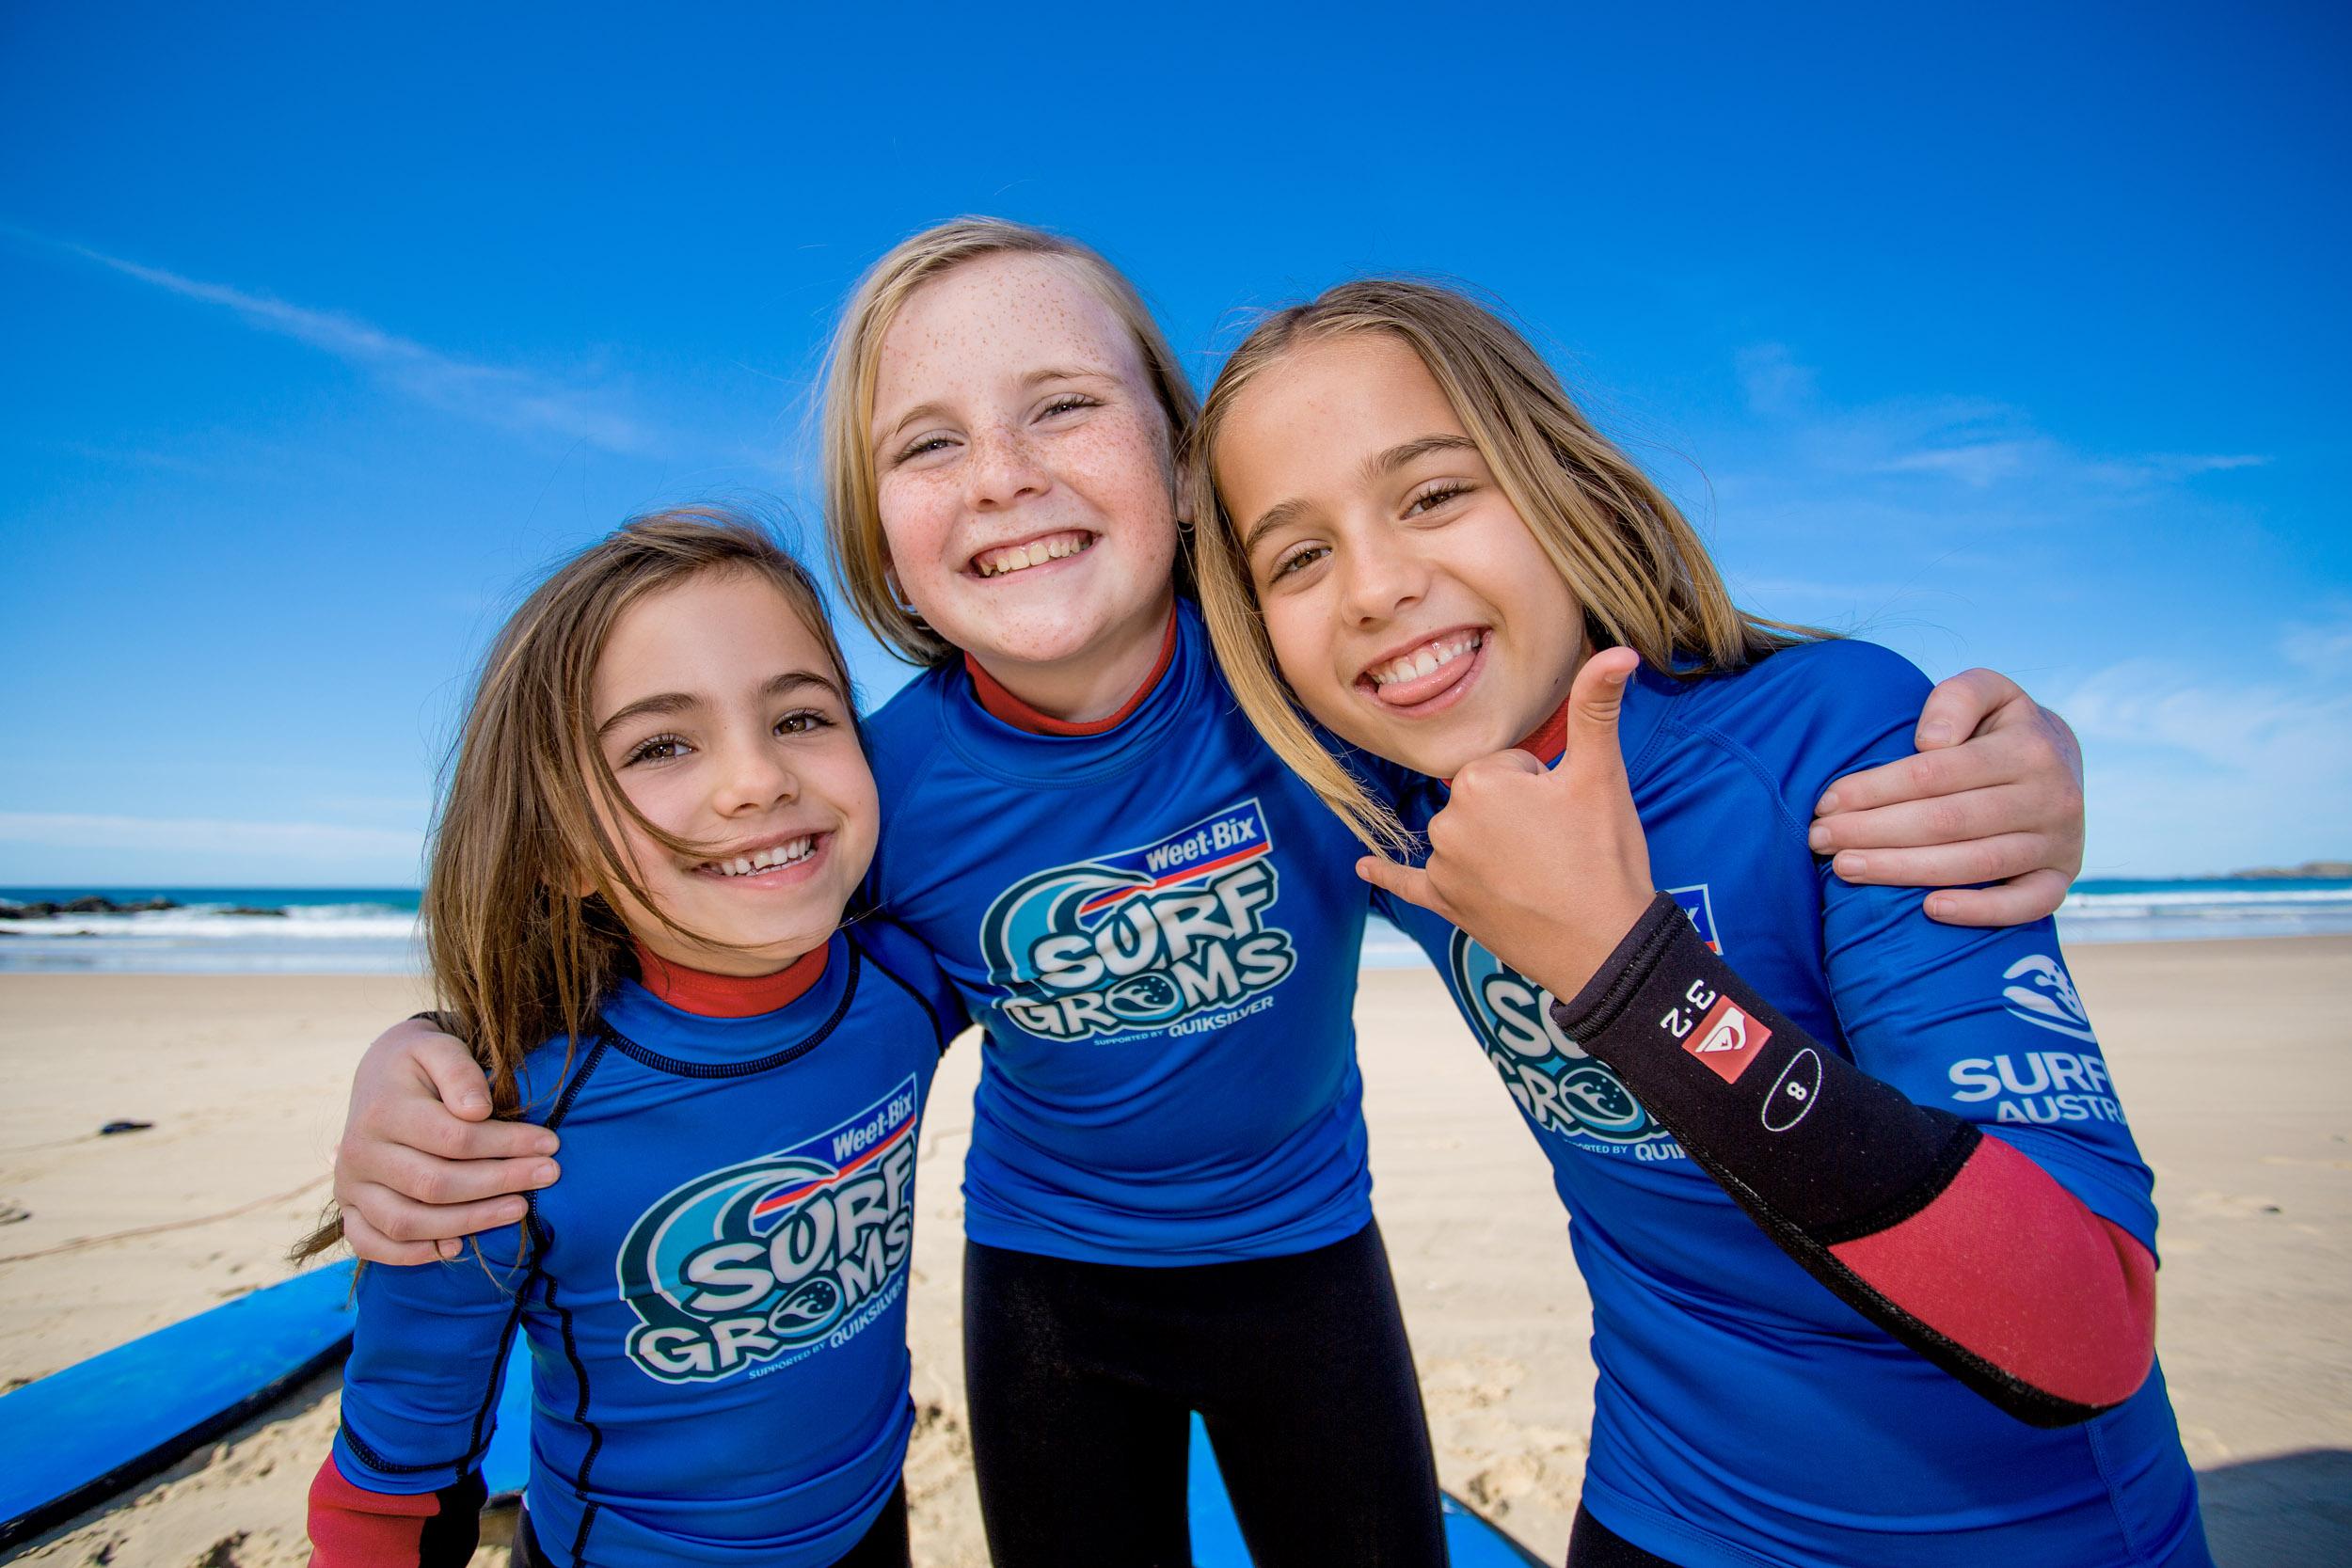 surfing-australia-surf-groms-photography-SGWB-241.jpg